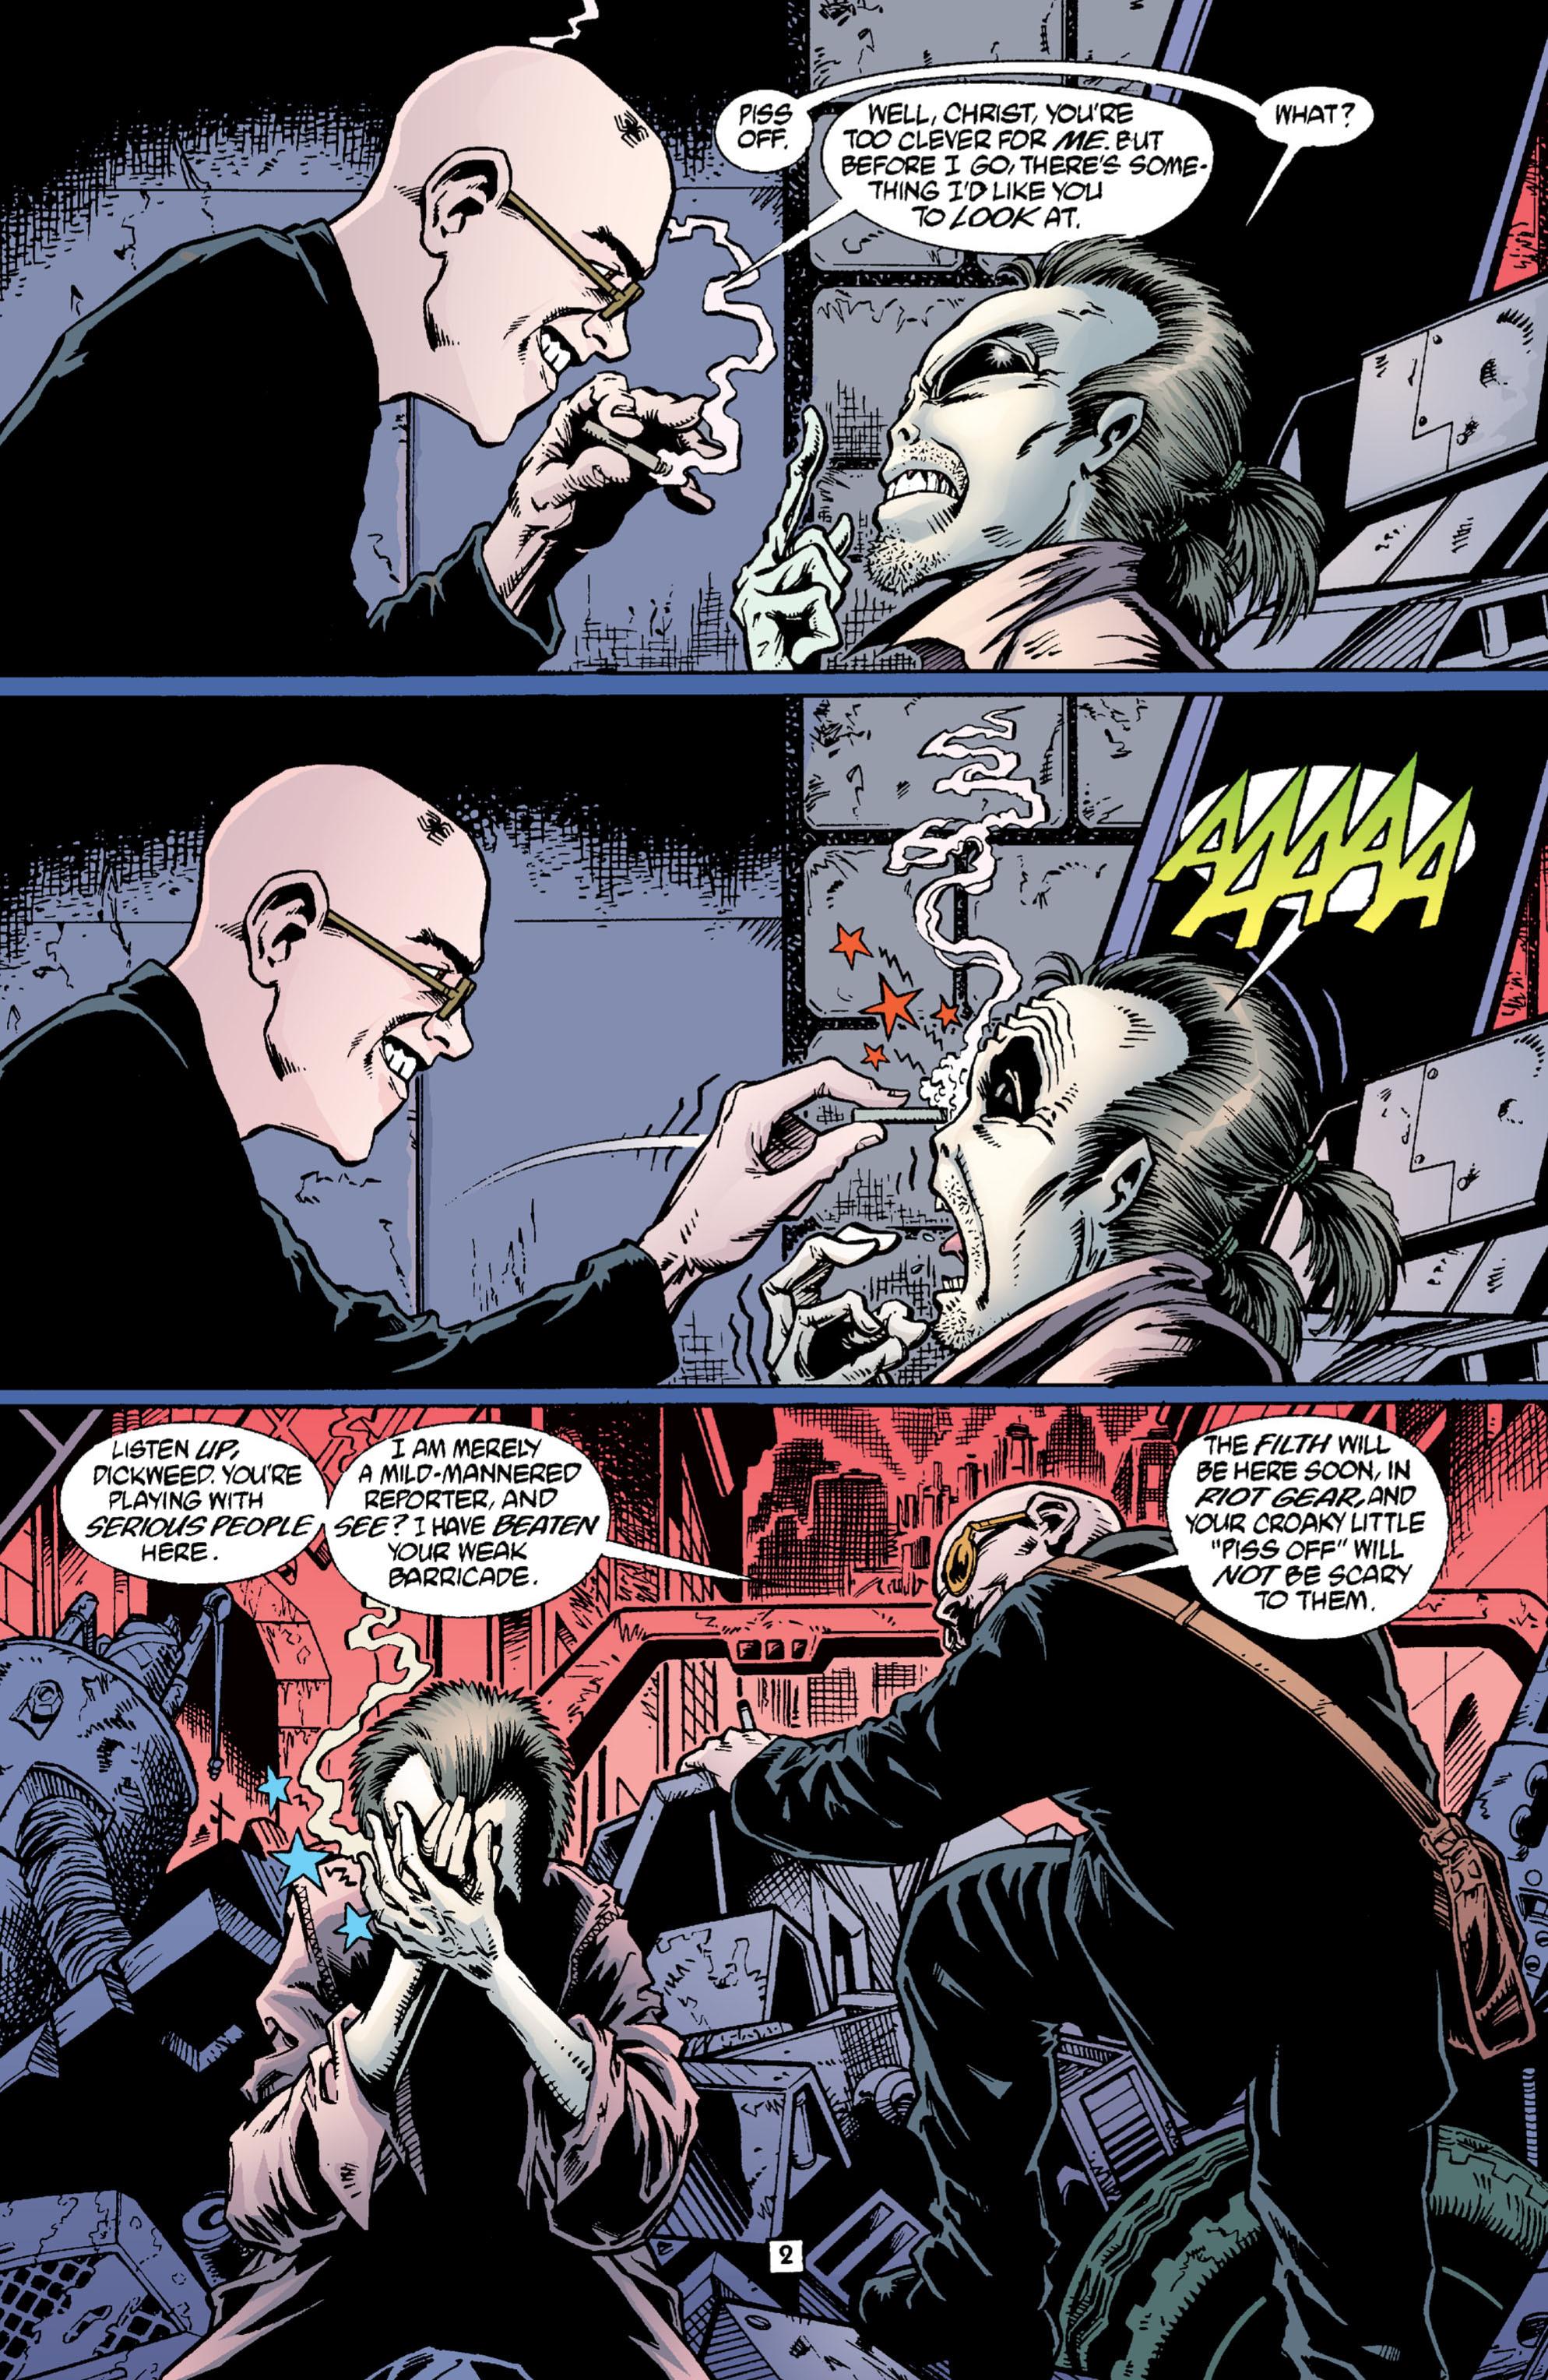 Read online Transmetropolitan comic -  Issue #2 - 3